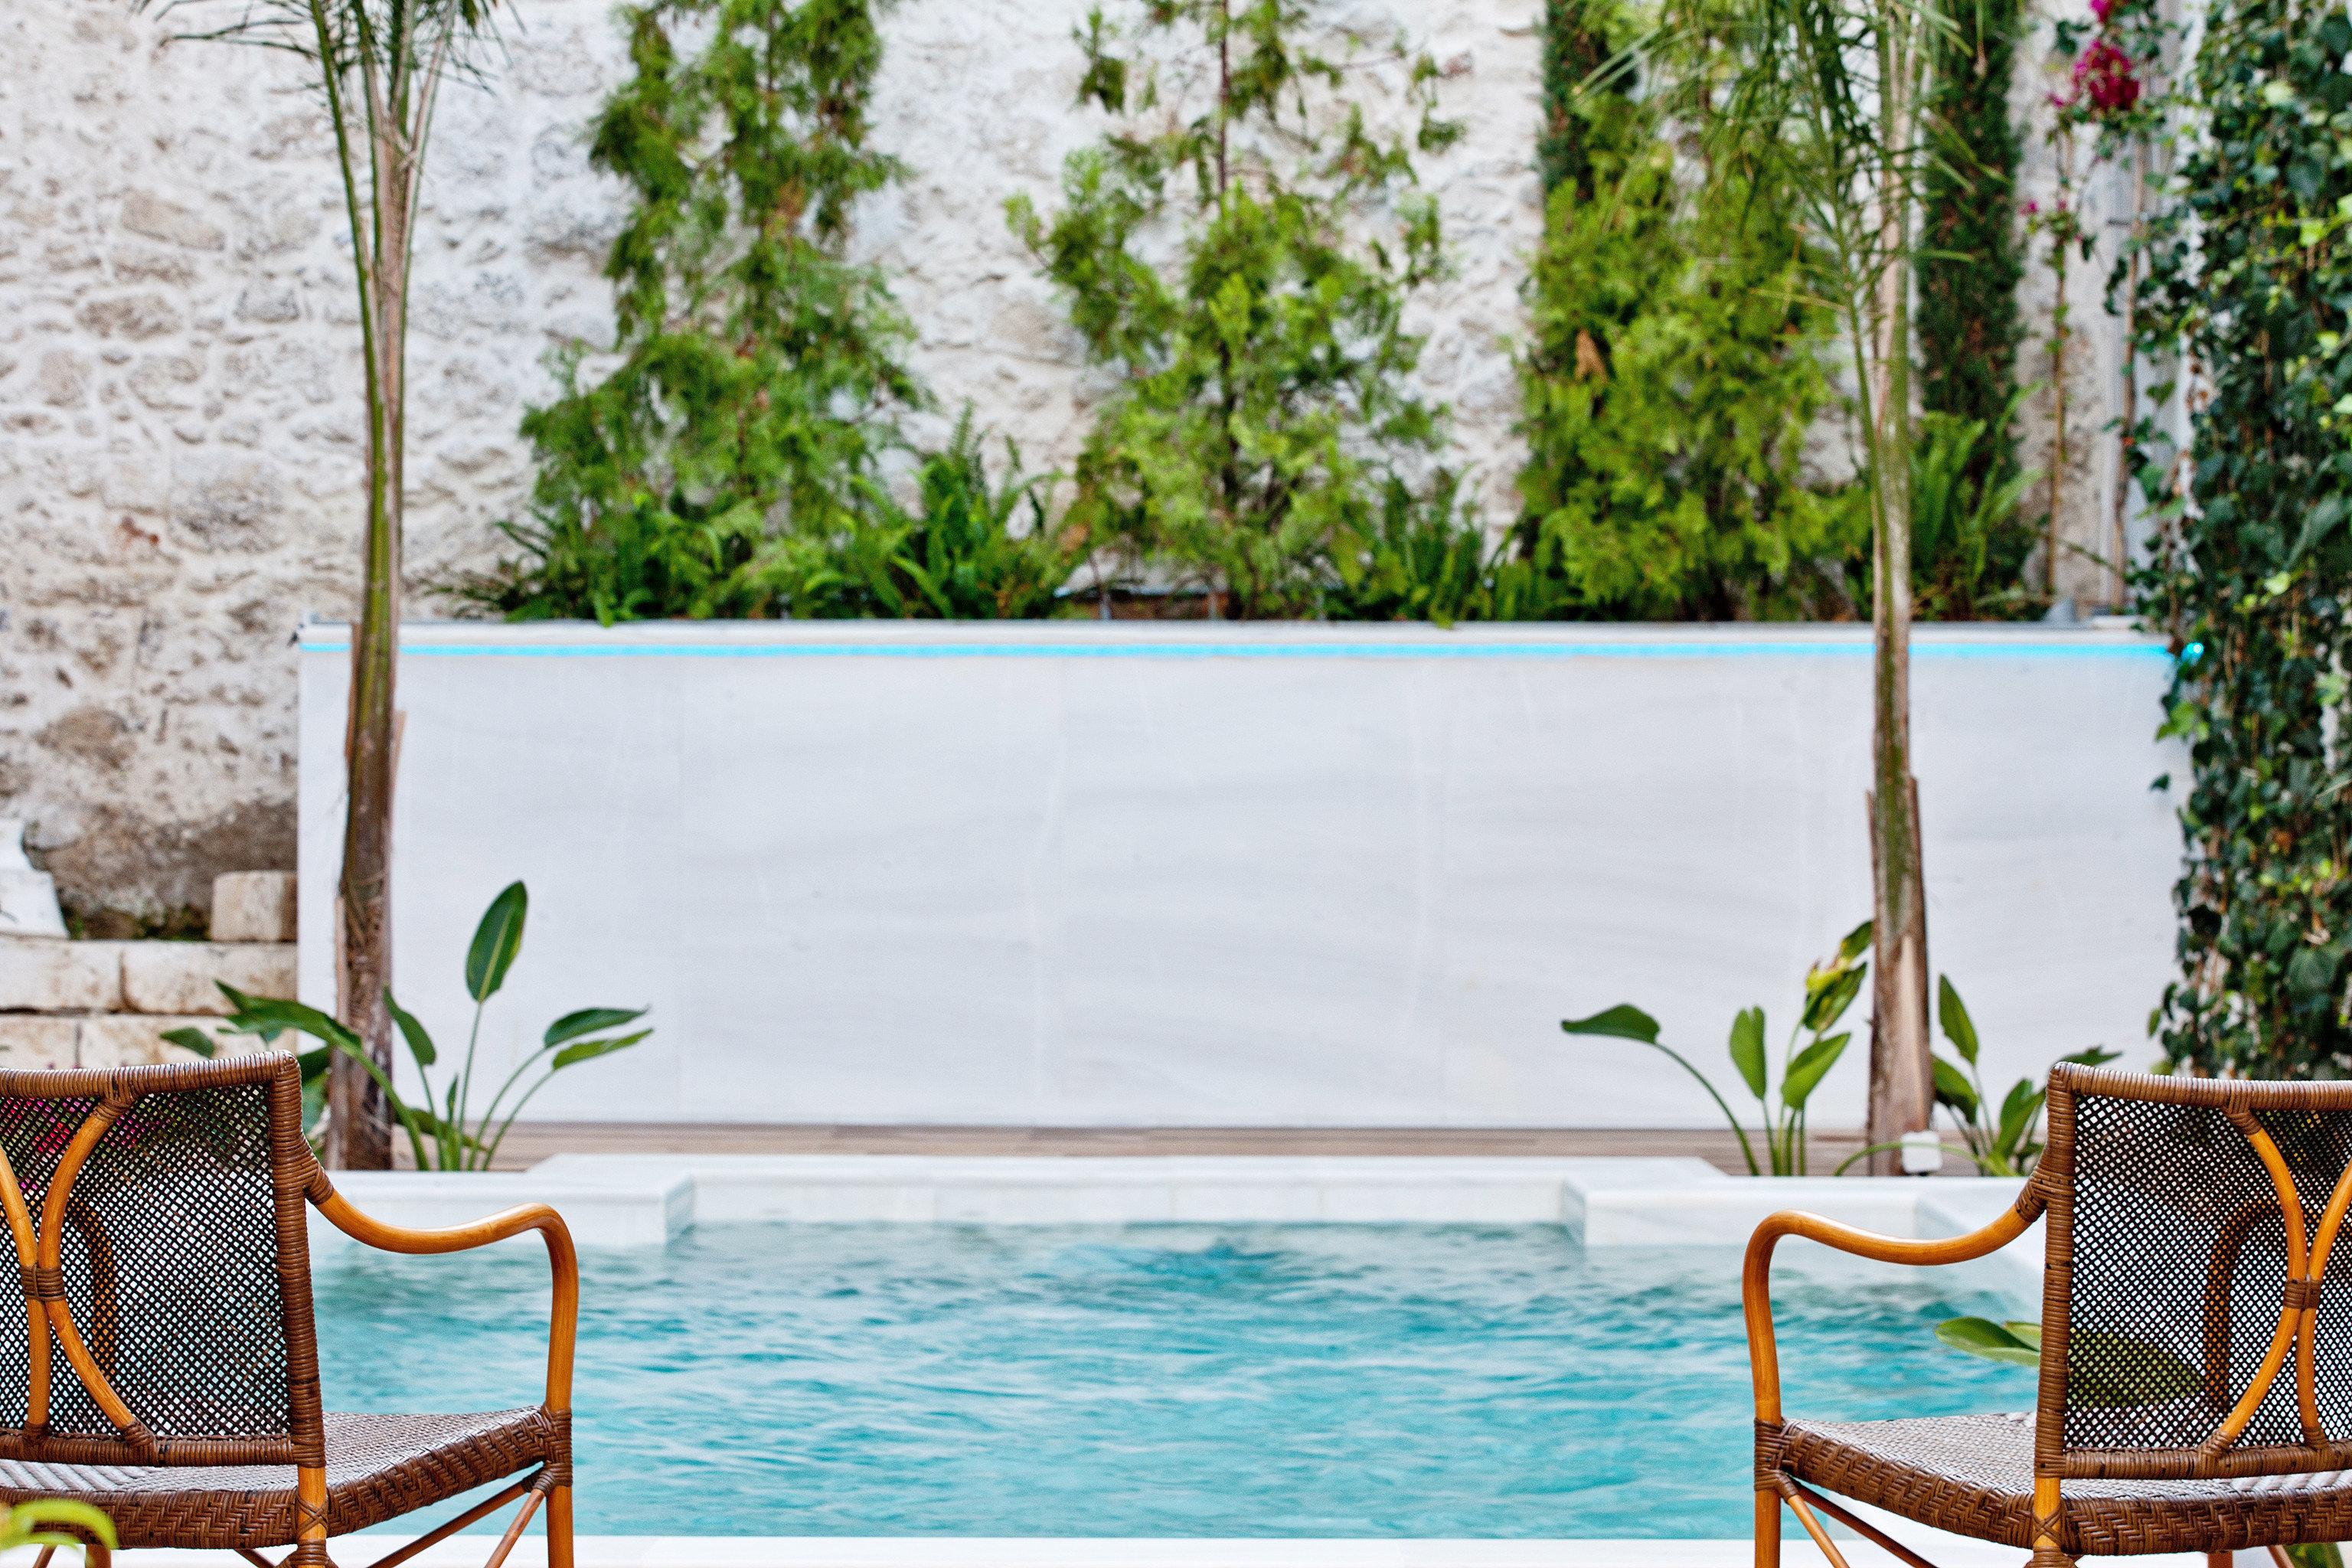 Lounge Luxury Modern Pool Trip Ideas tree outdoor chair swimming pool backyard home estate interior design flower